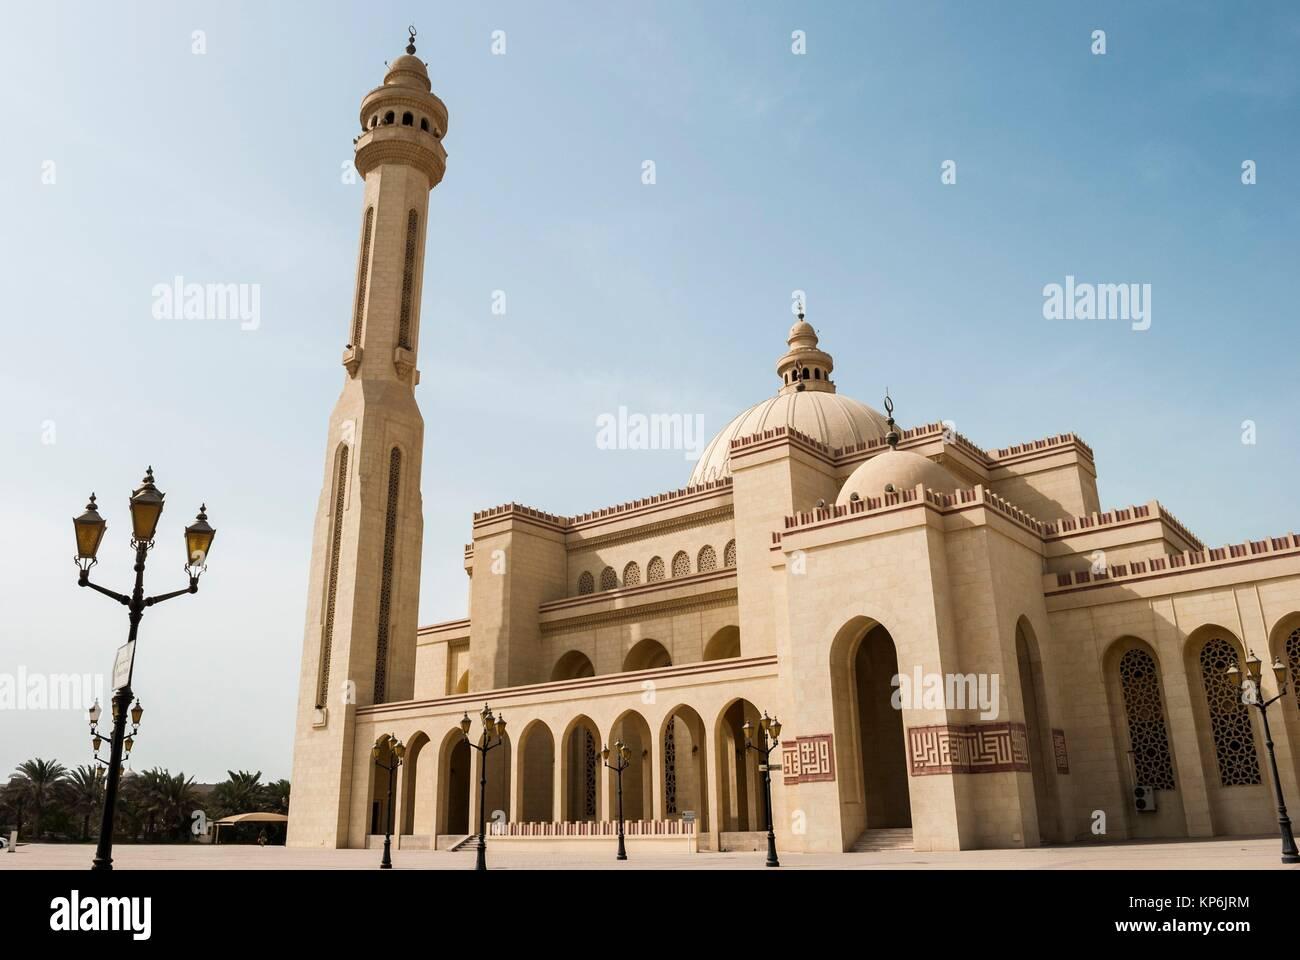 Al Fateh Grand Mosque, Manama, Bahrain, United Arab Emirates. - Stock Image